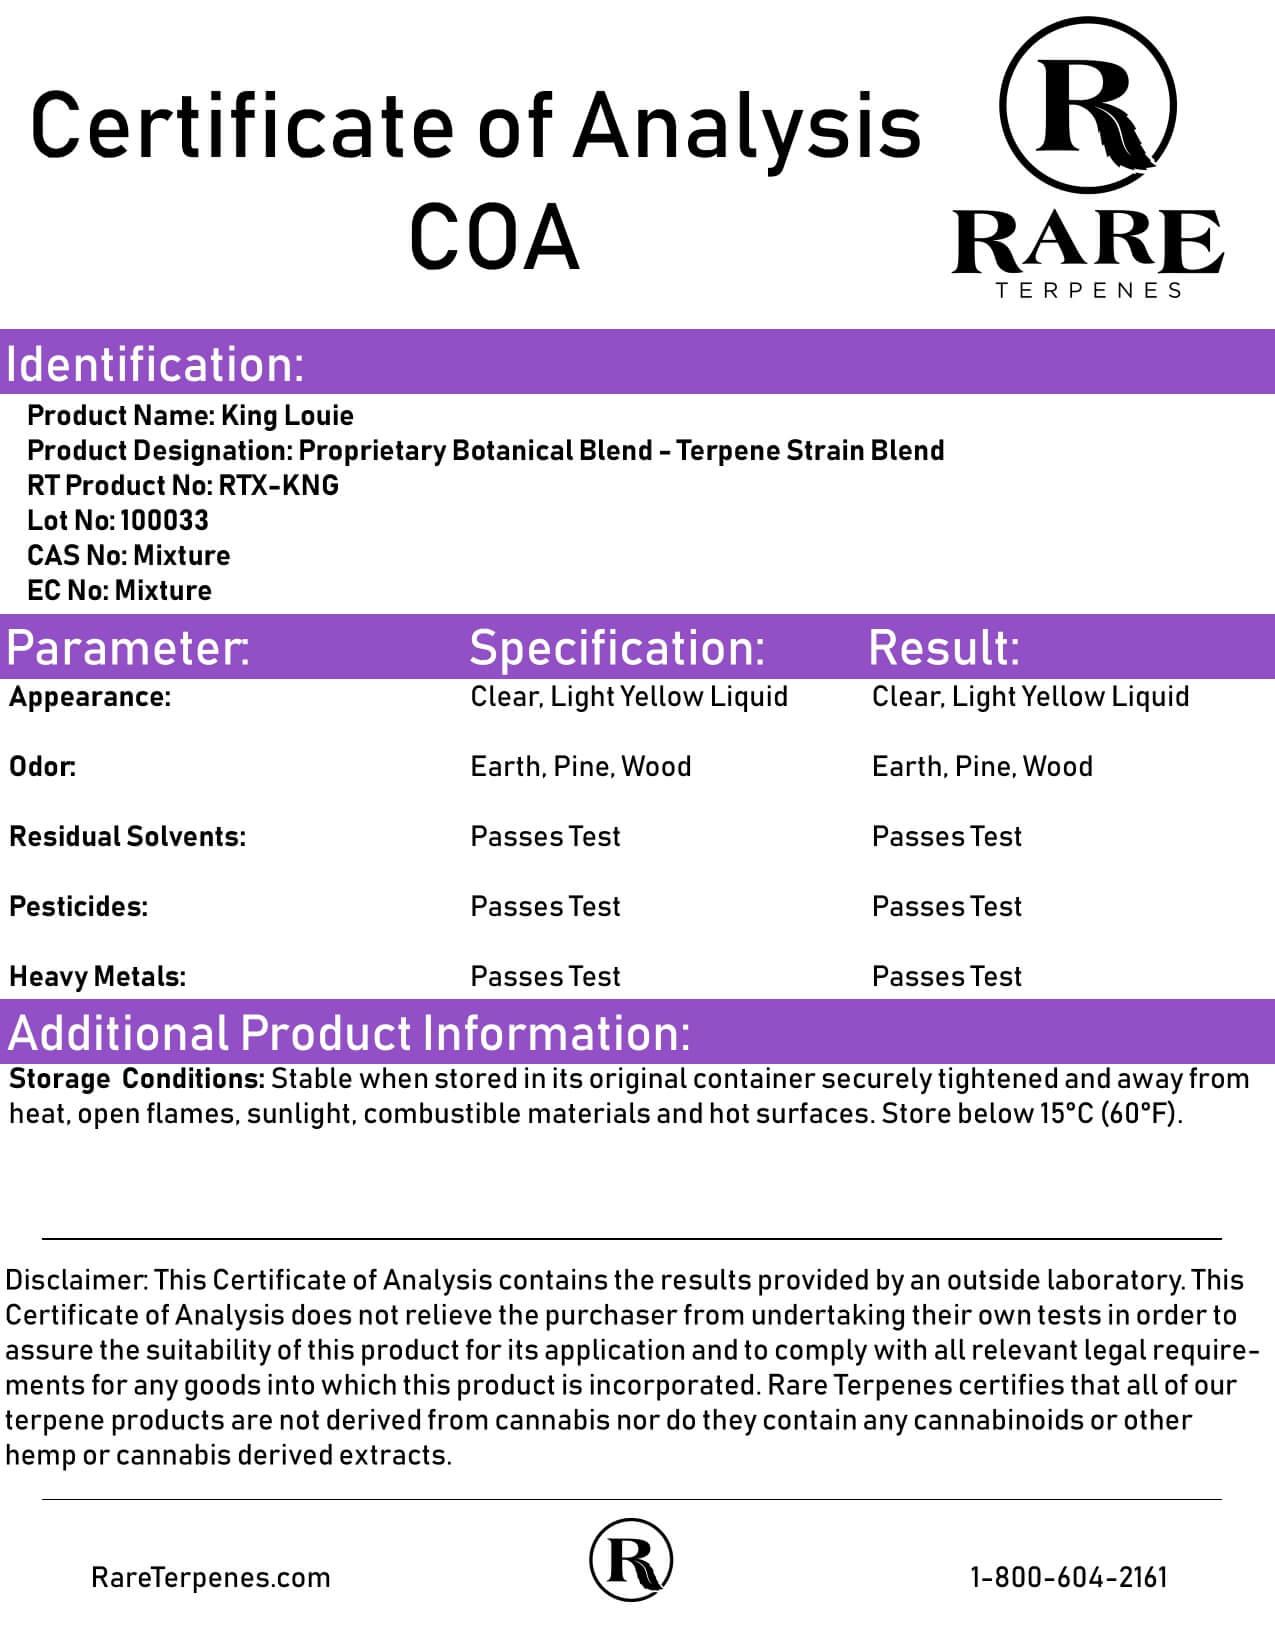 Rare Terpenes Tepene Strain Blends King Louie Lab Report